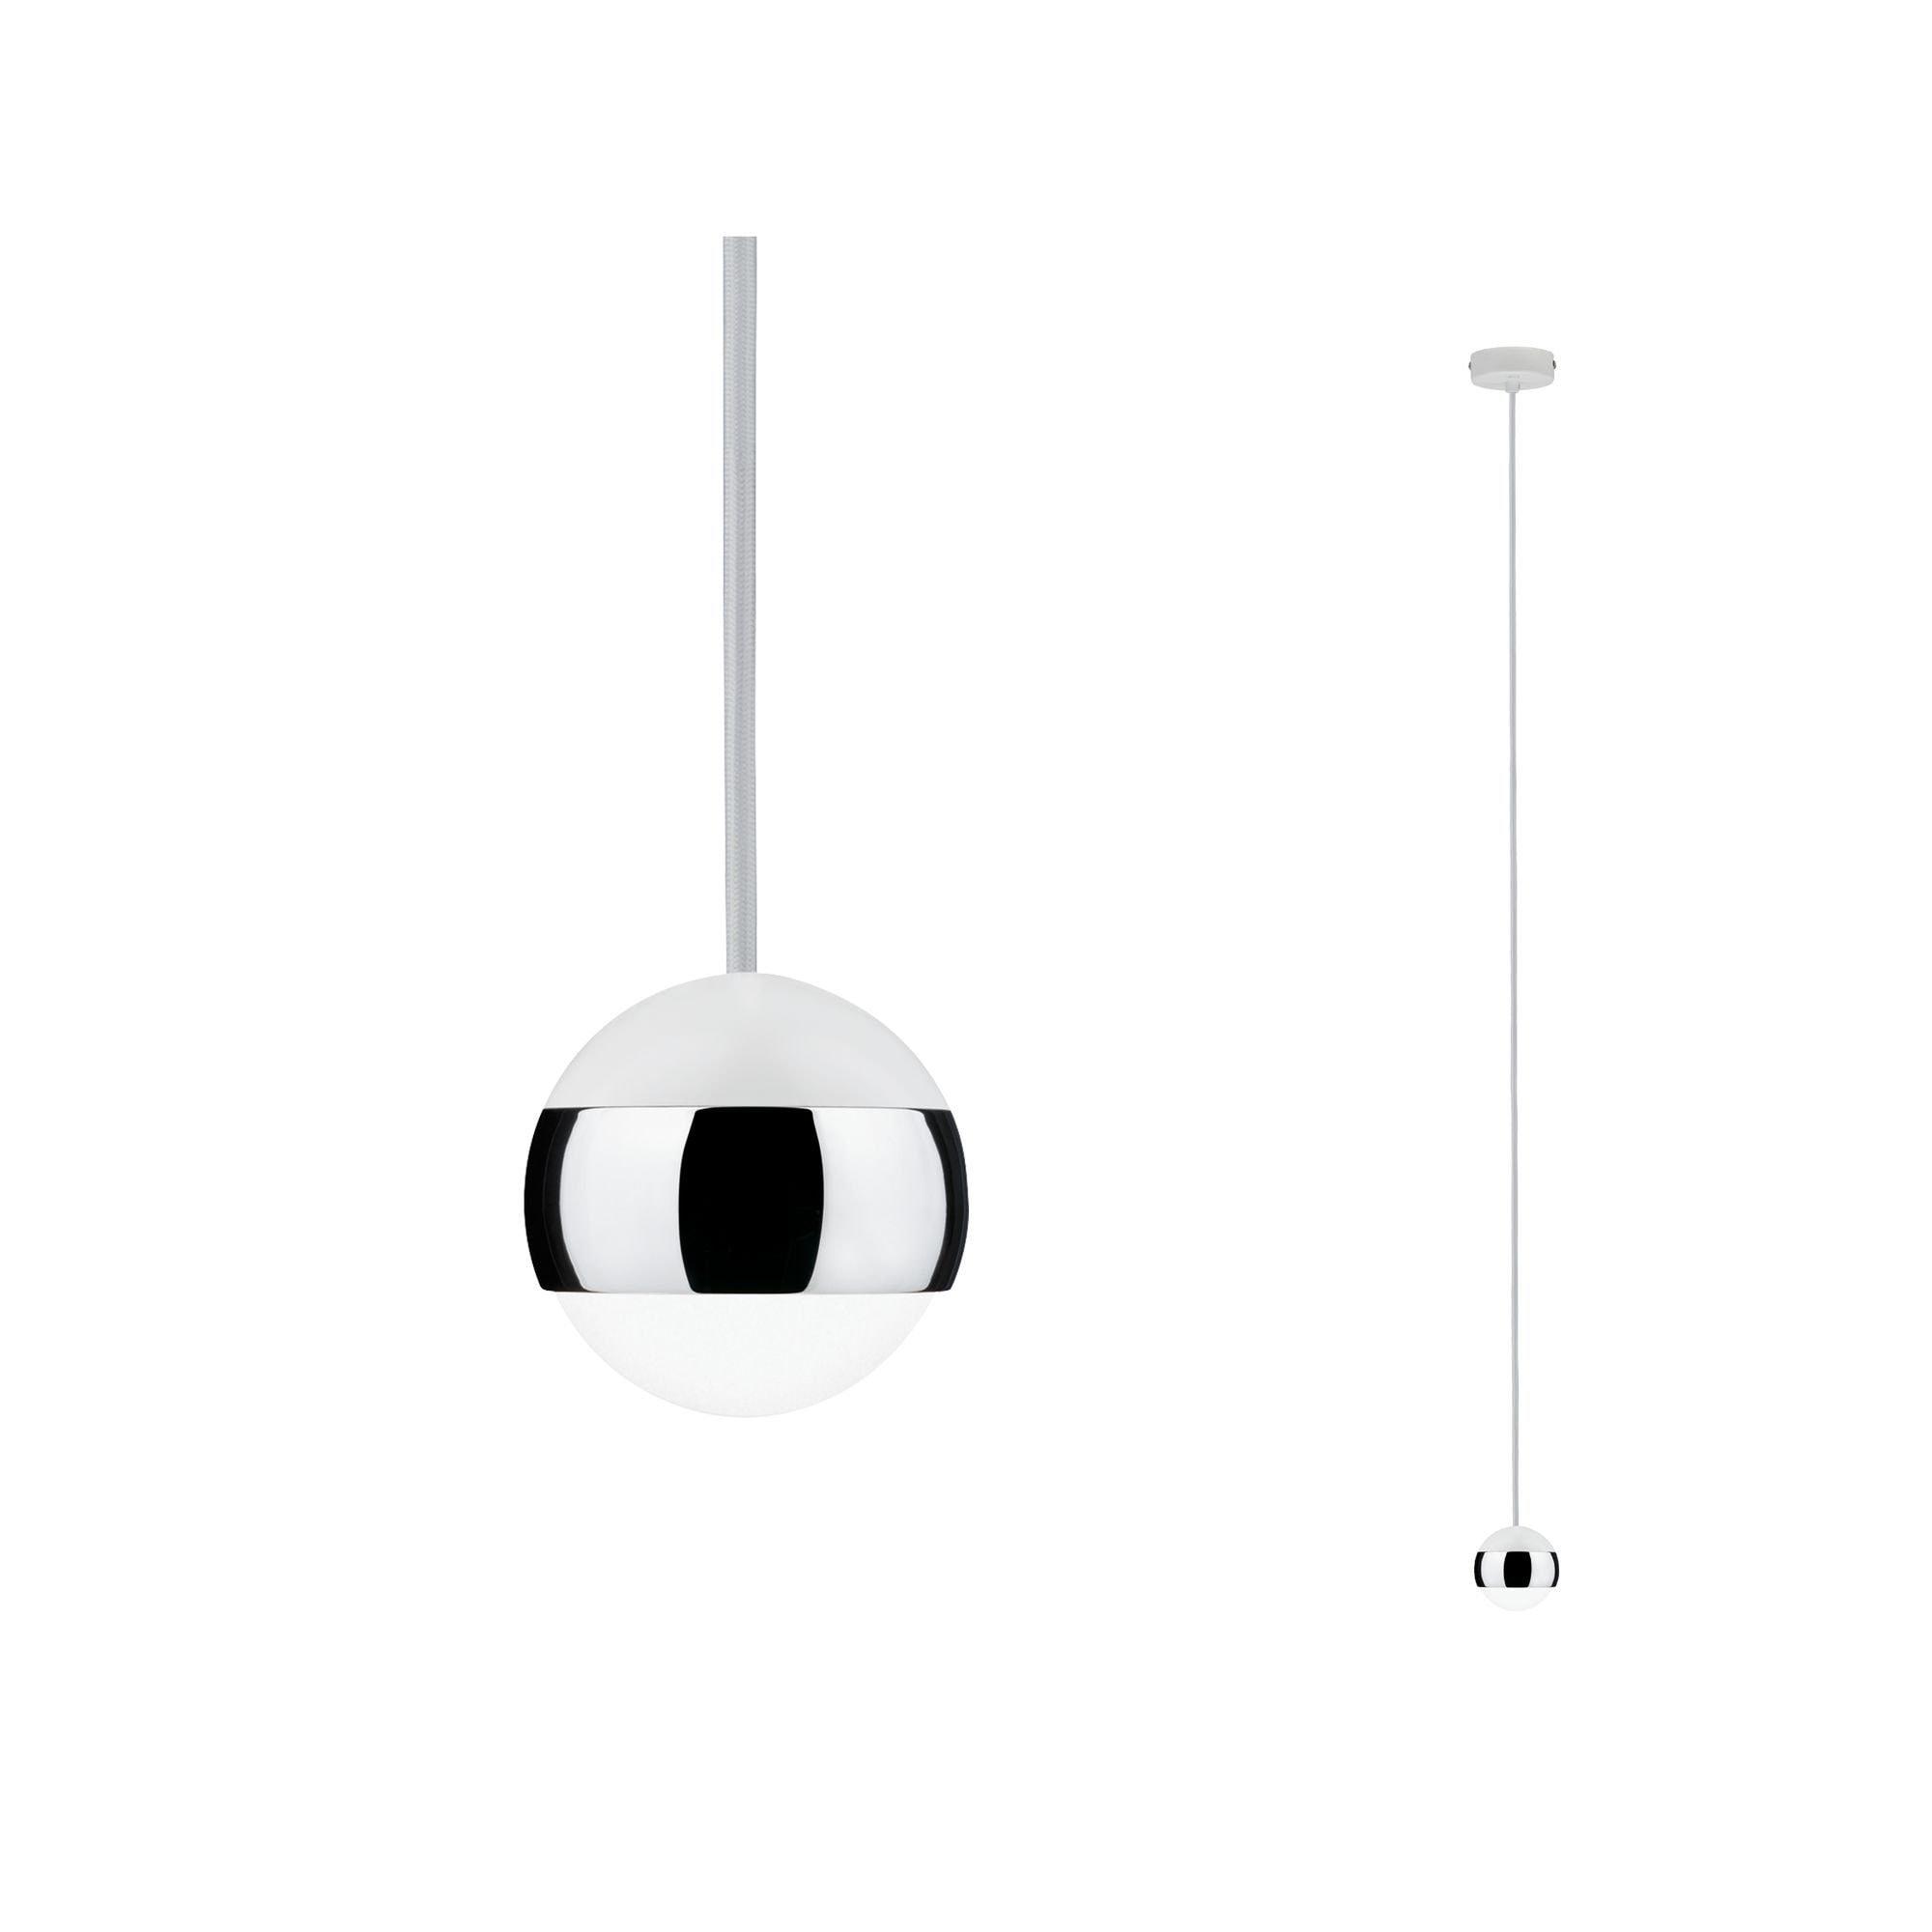 Paulmann LED Pendelleuchte Capsule 6W Weiß/Chrom, 1 St., Warmweiß